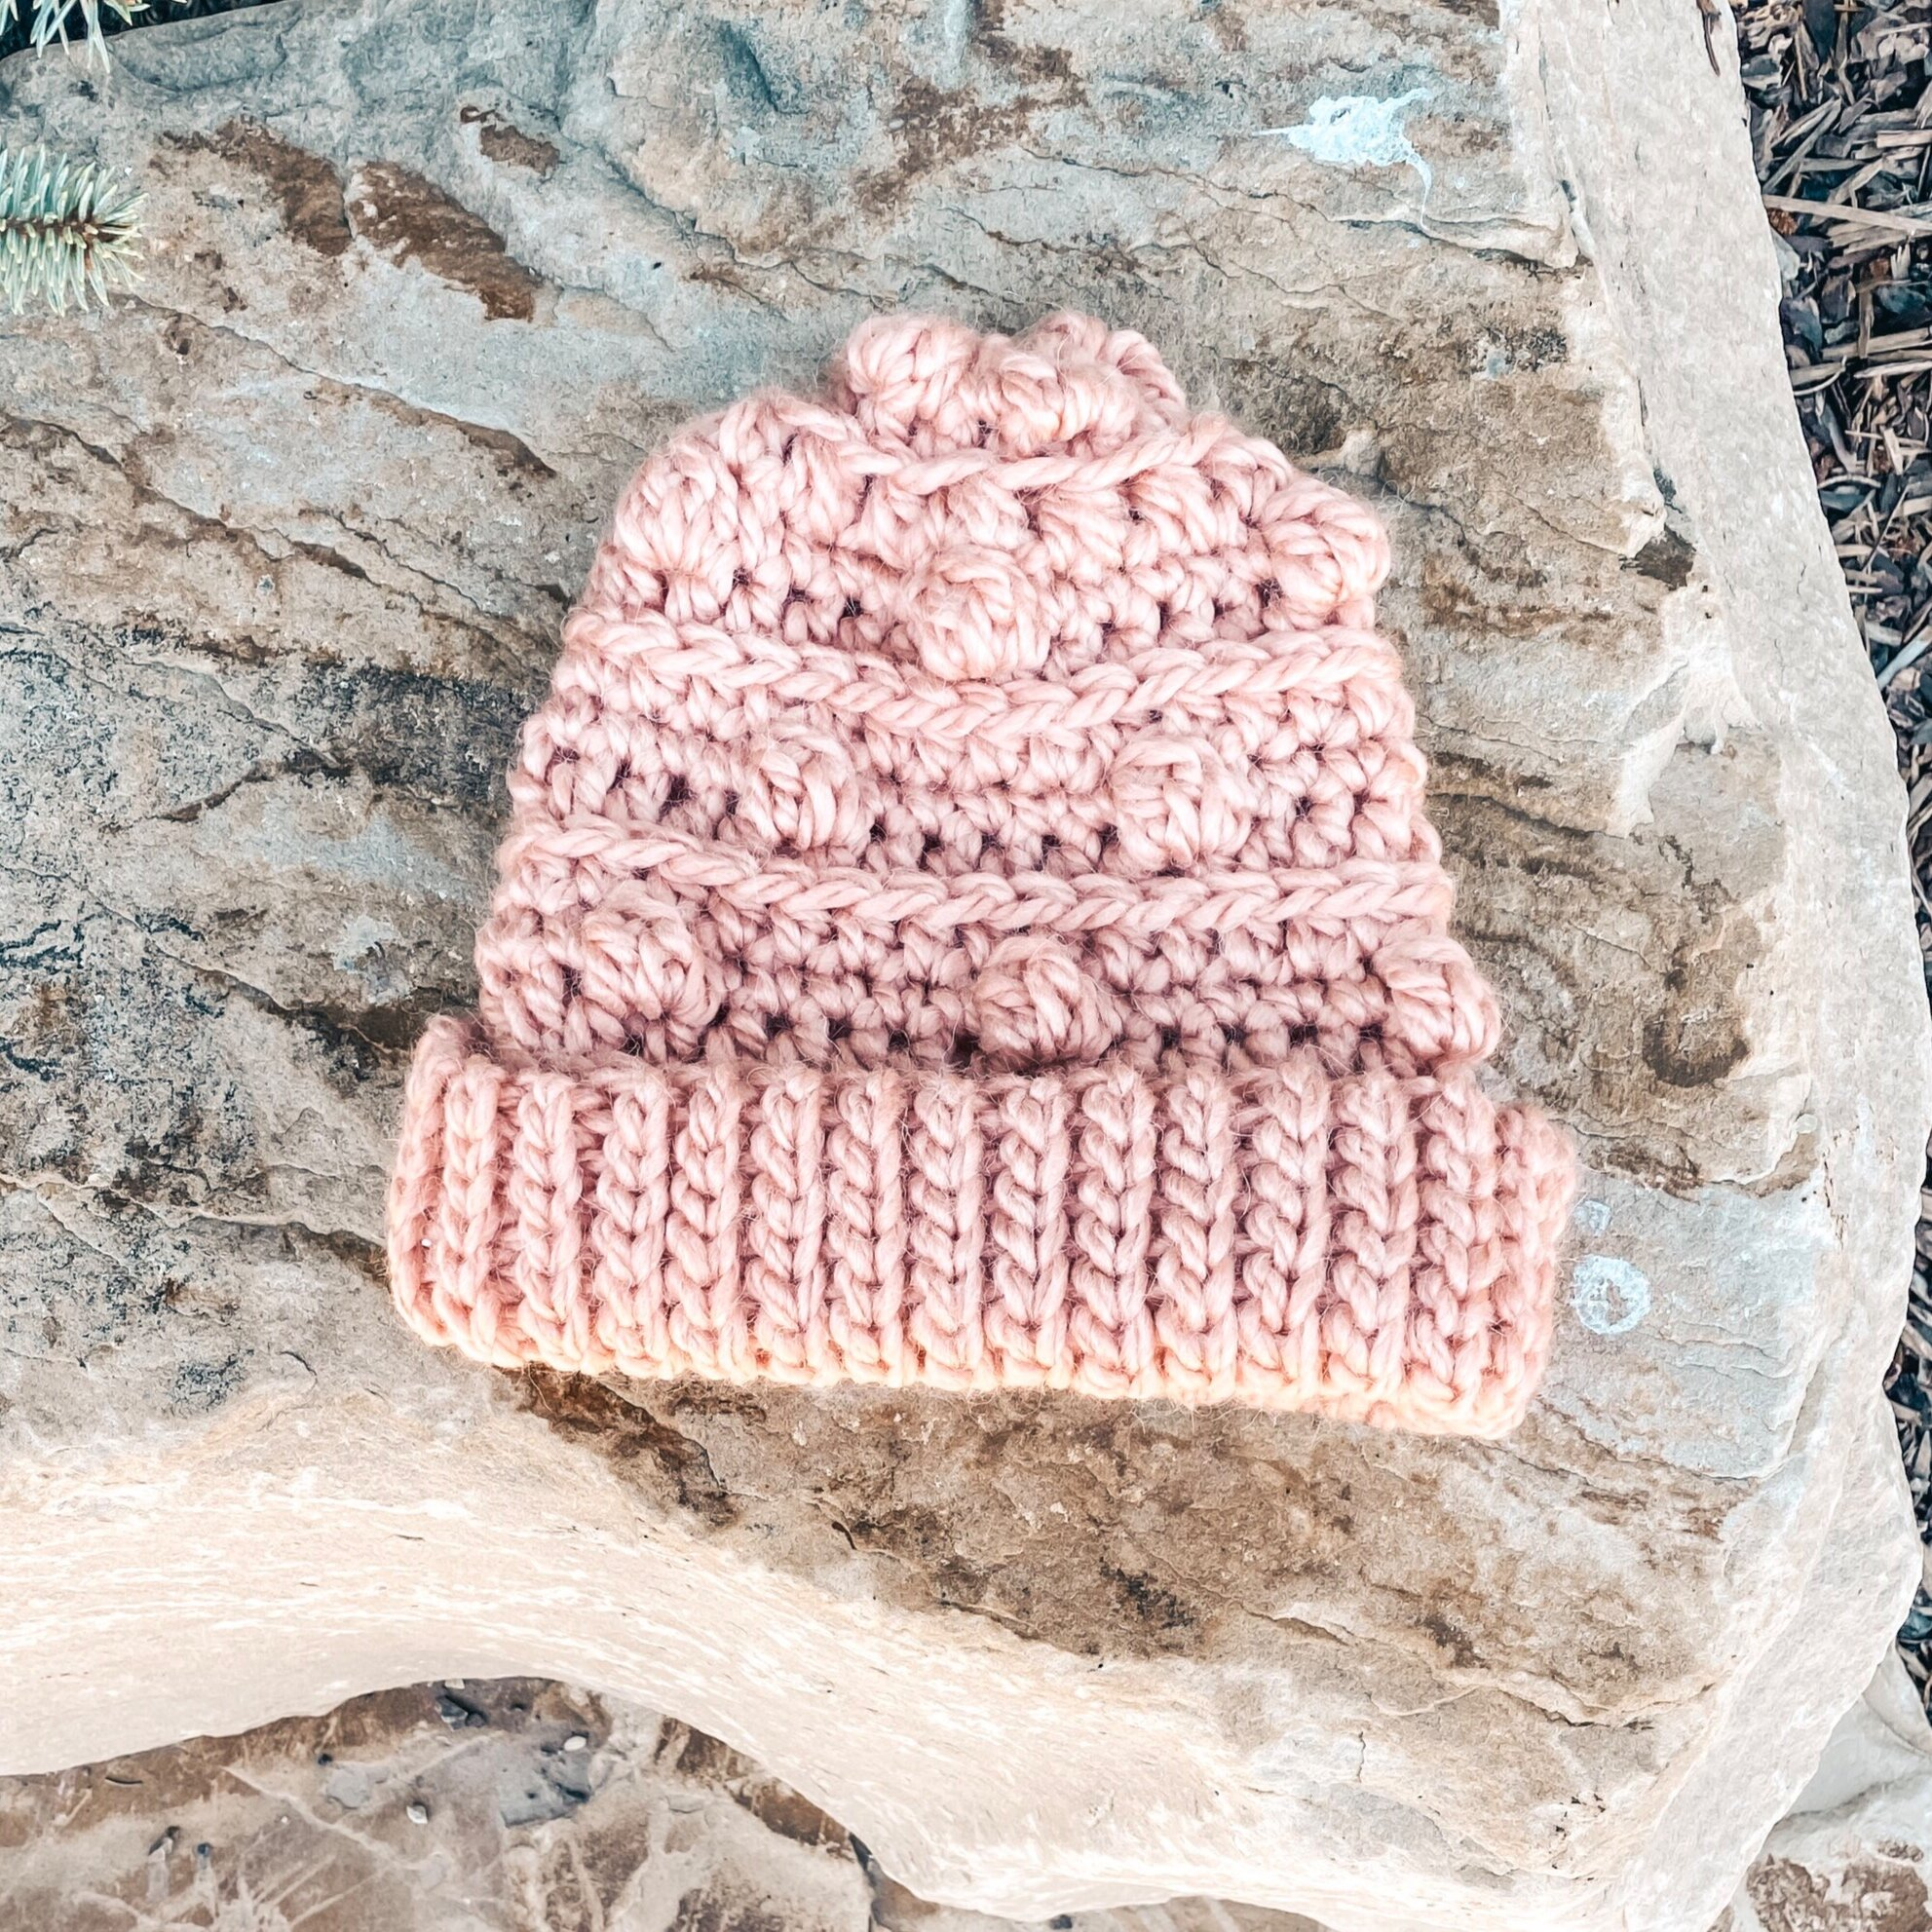 Park+City+Beanie+-+Crochet+Pattern+-+The+Roving+Nomad